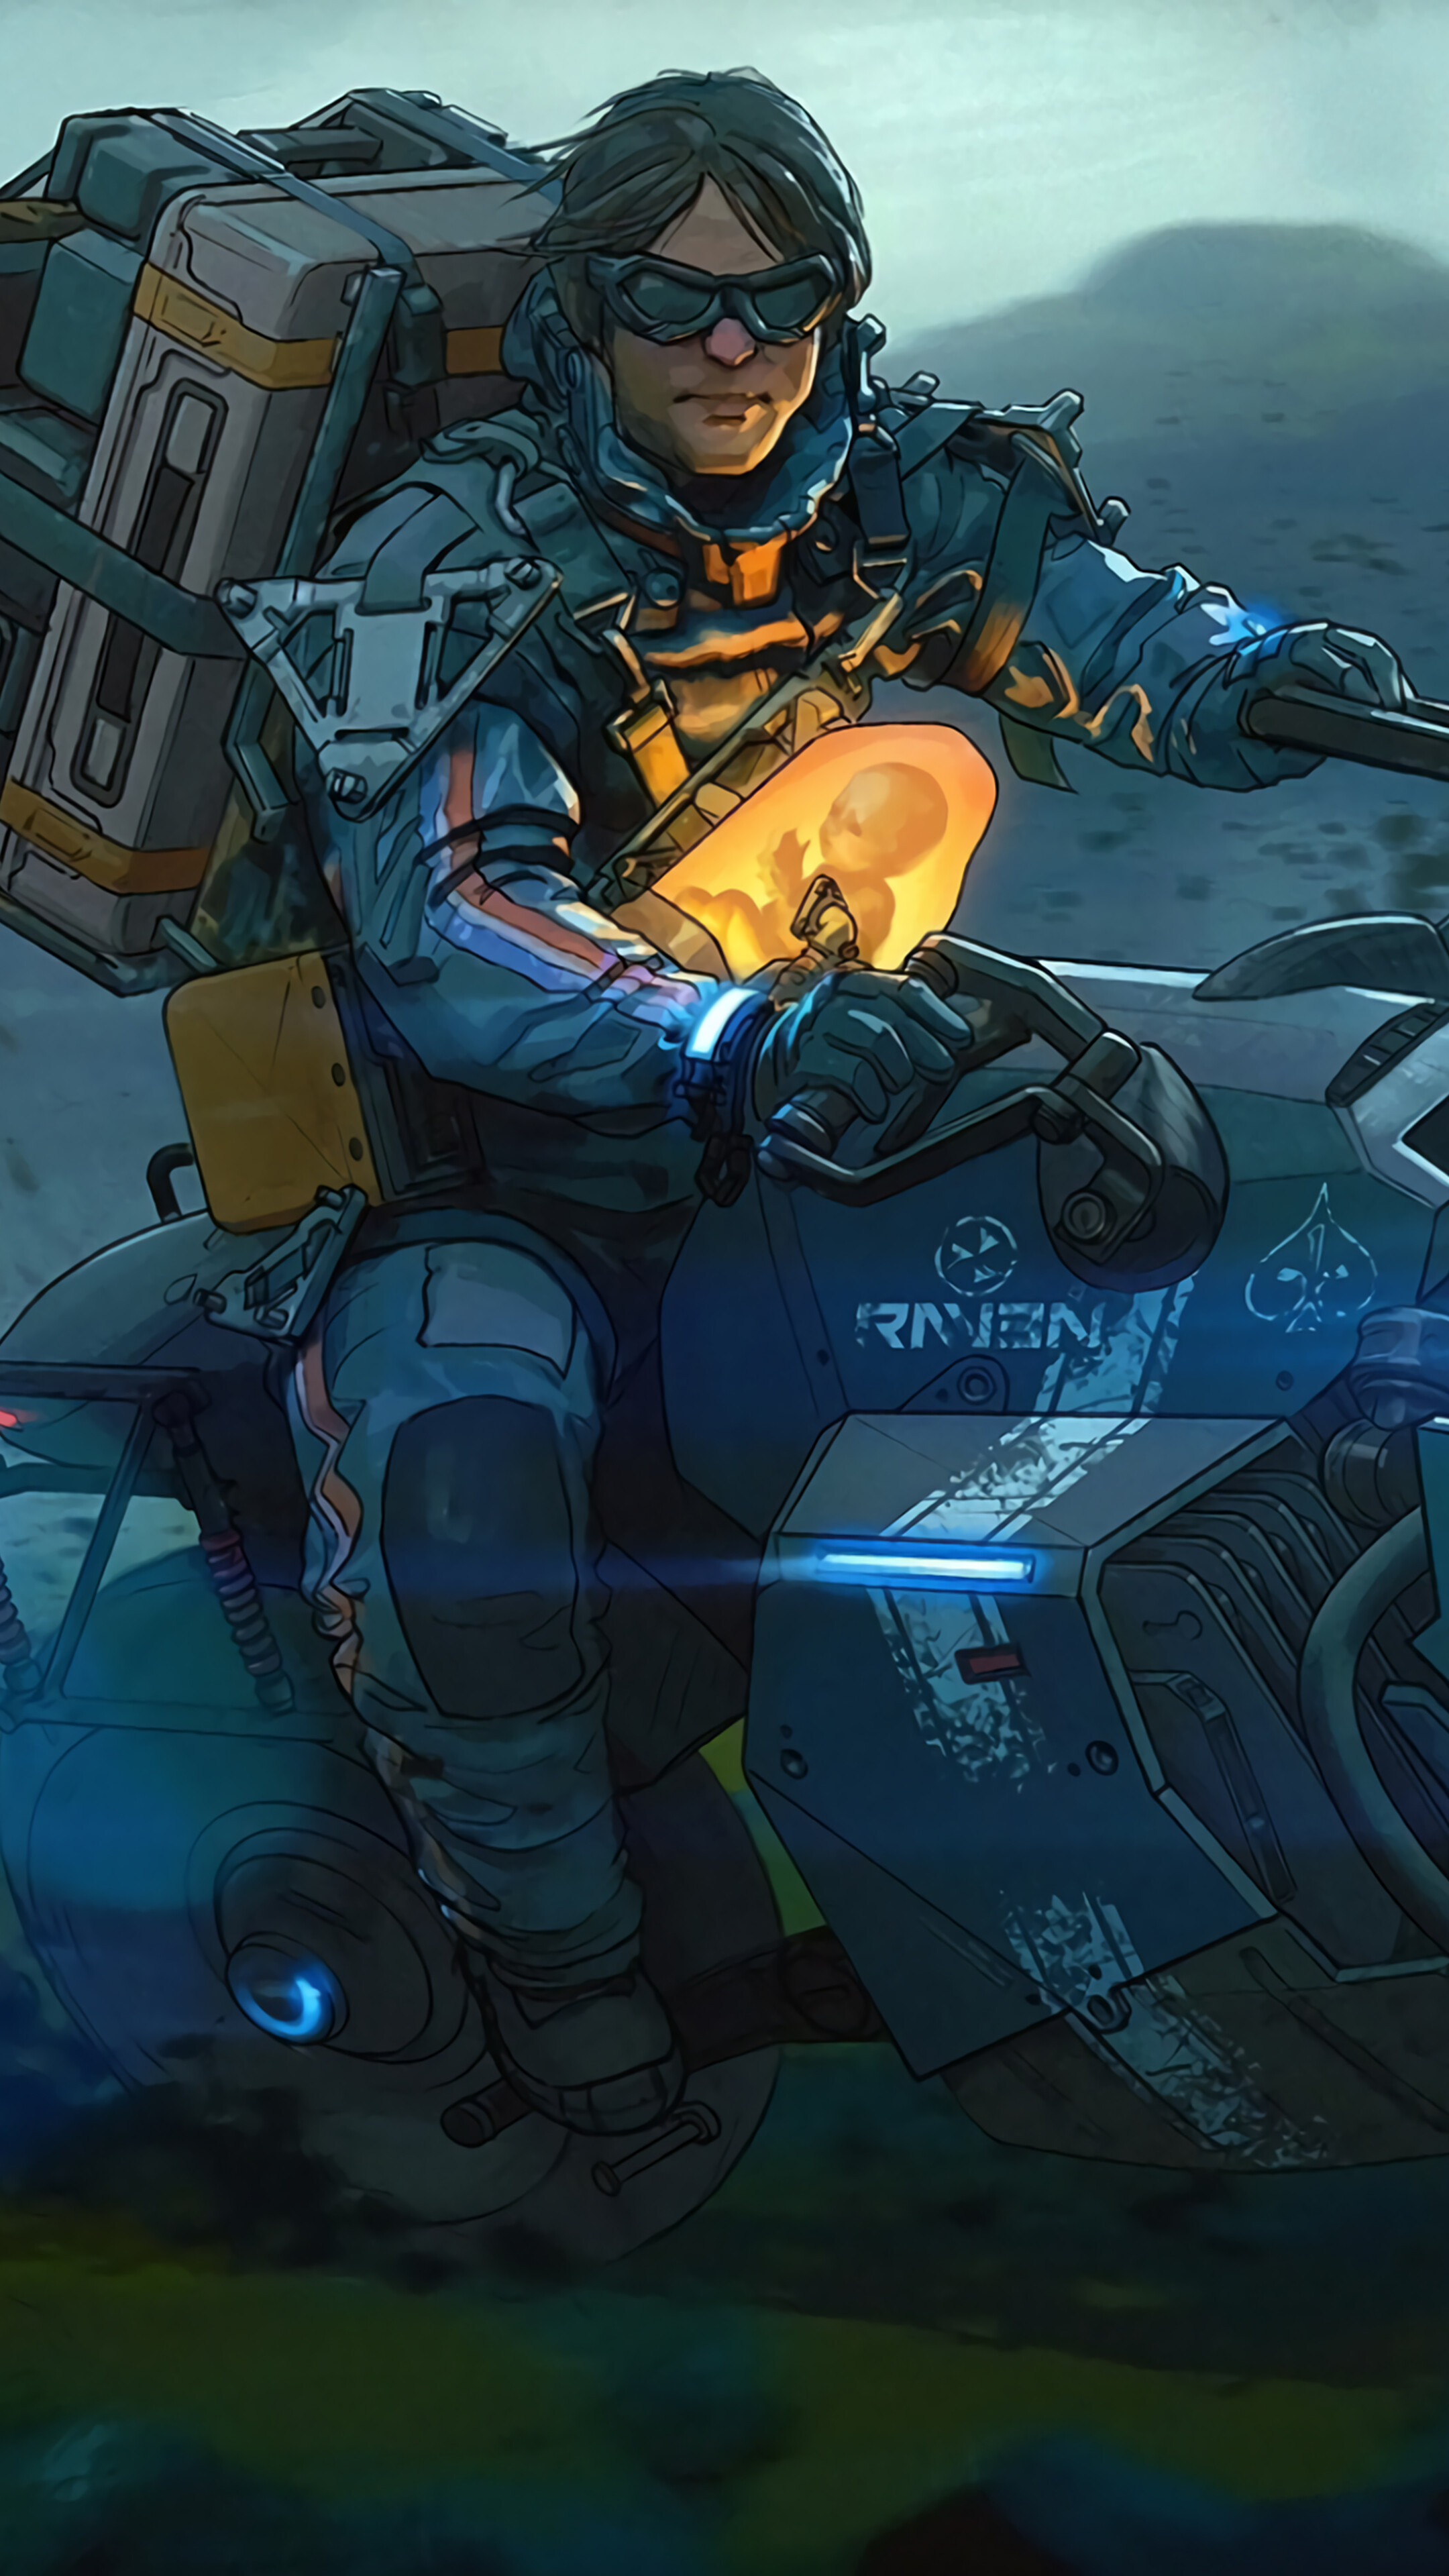 Death Stranding Motorcycle Days Gone 4K Wallpaper 51369 2160x3840